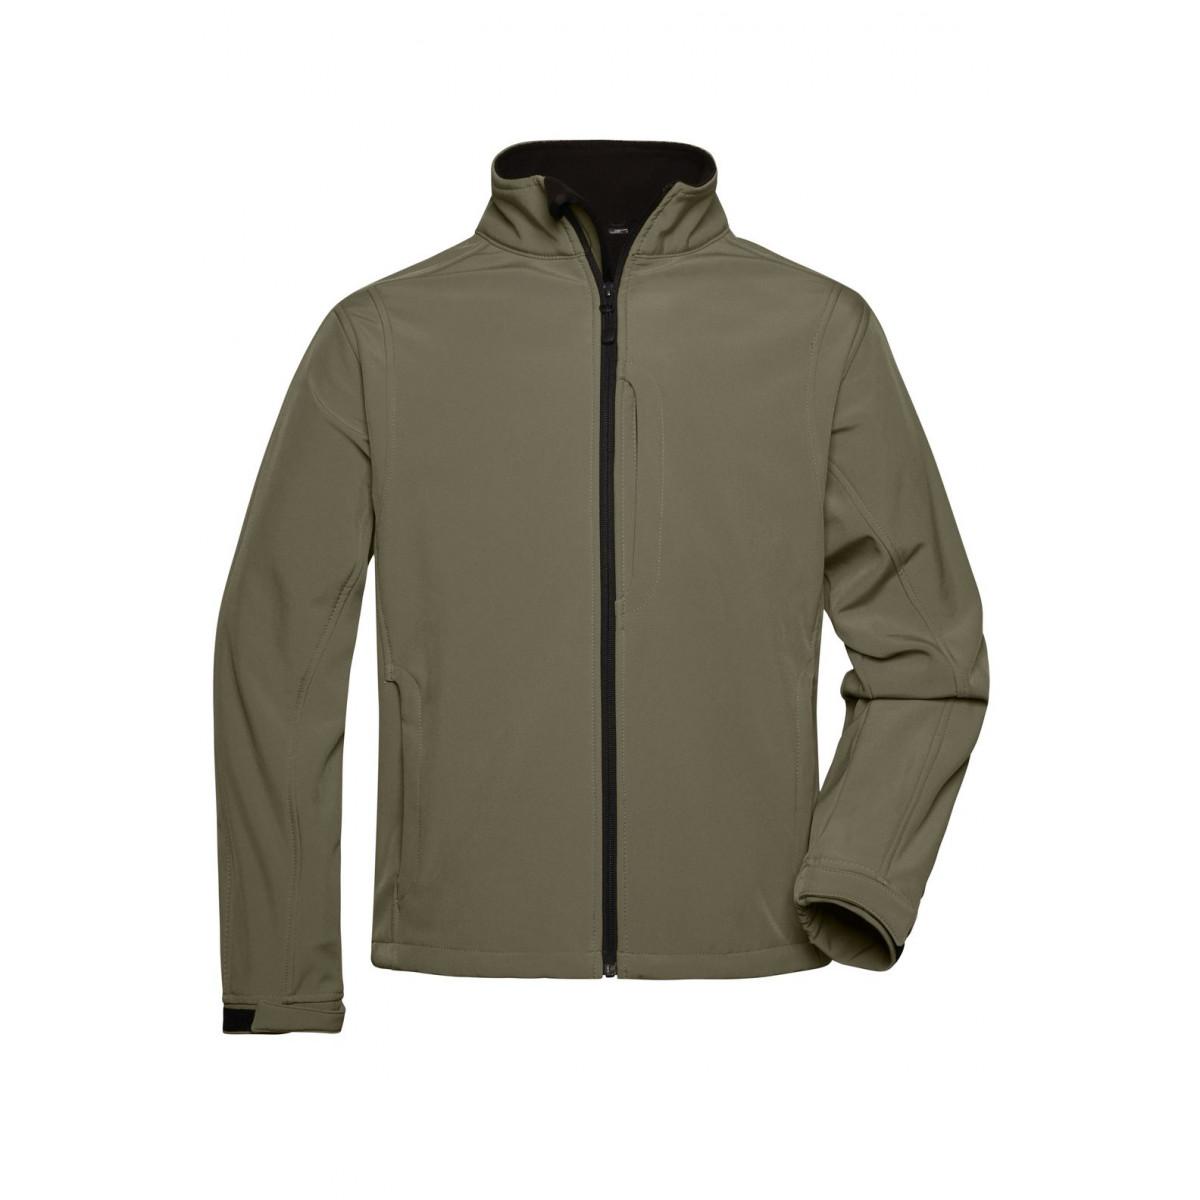 Куртка мужская JN135 Mens Softshell Jacket - Оливковый